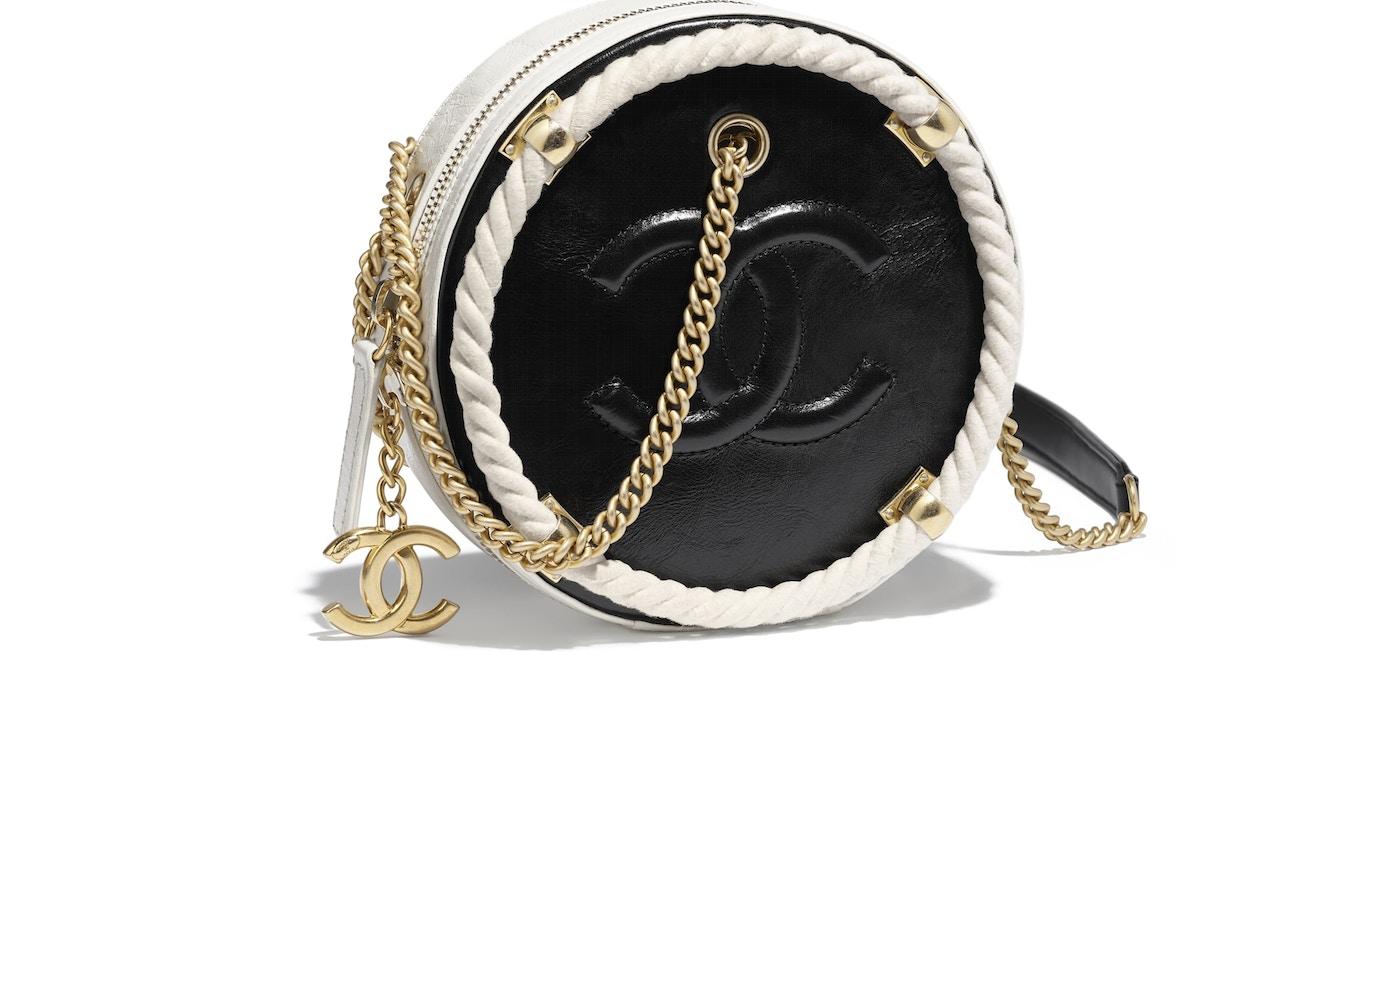 6d7b6d650c745b Chanel Round Bag Crumpled Calfskin Gold-tone Small Black/White